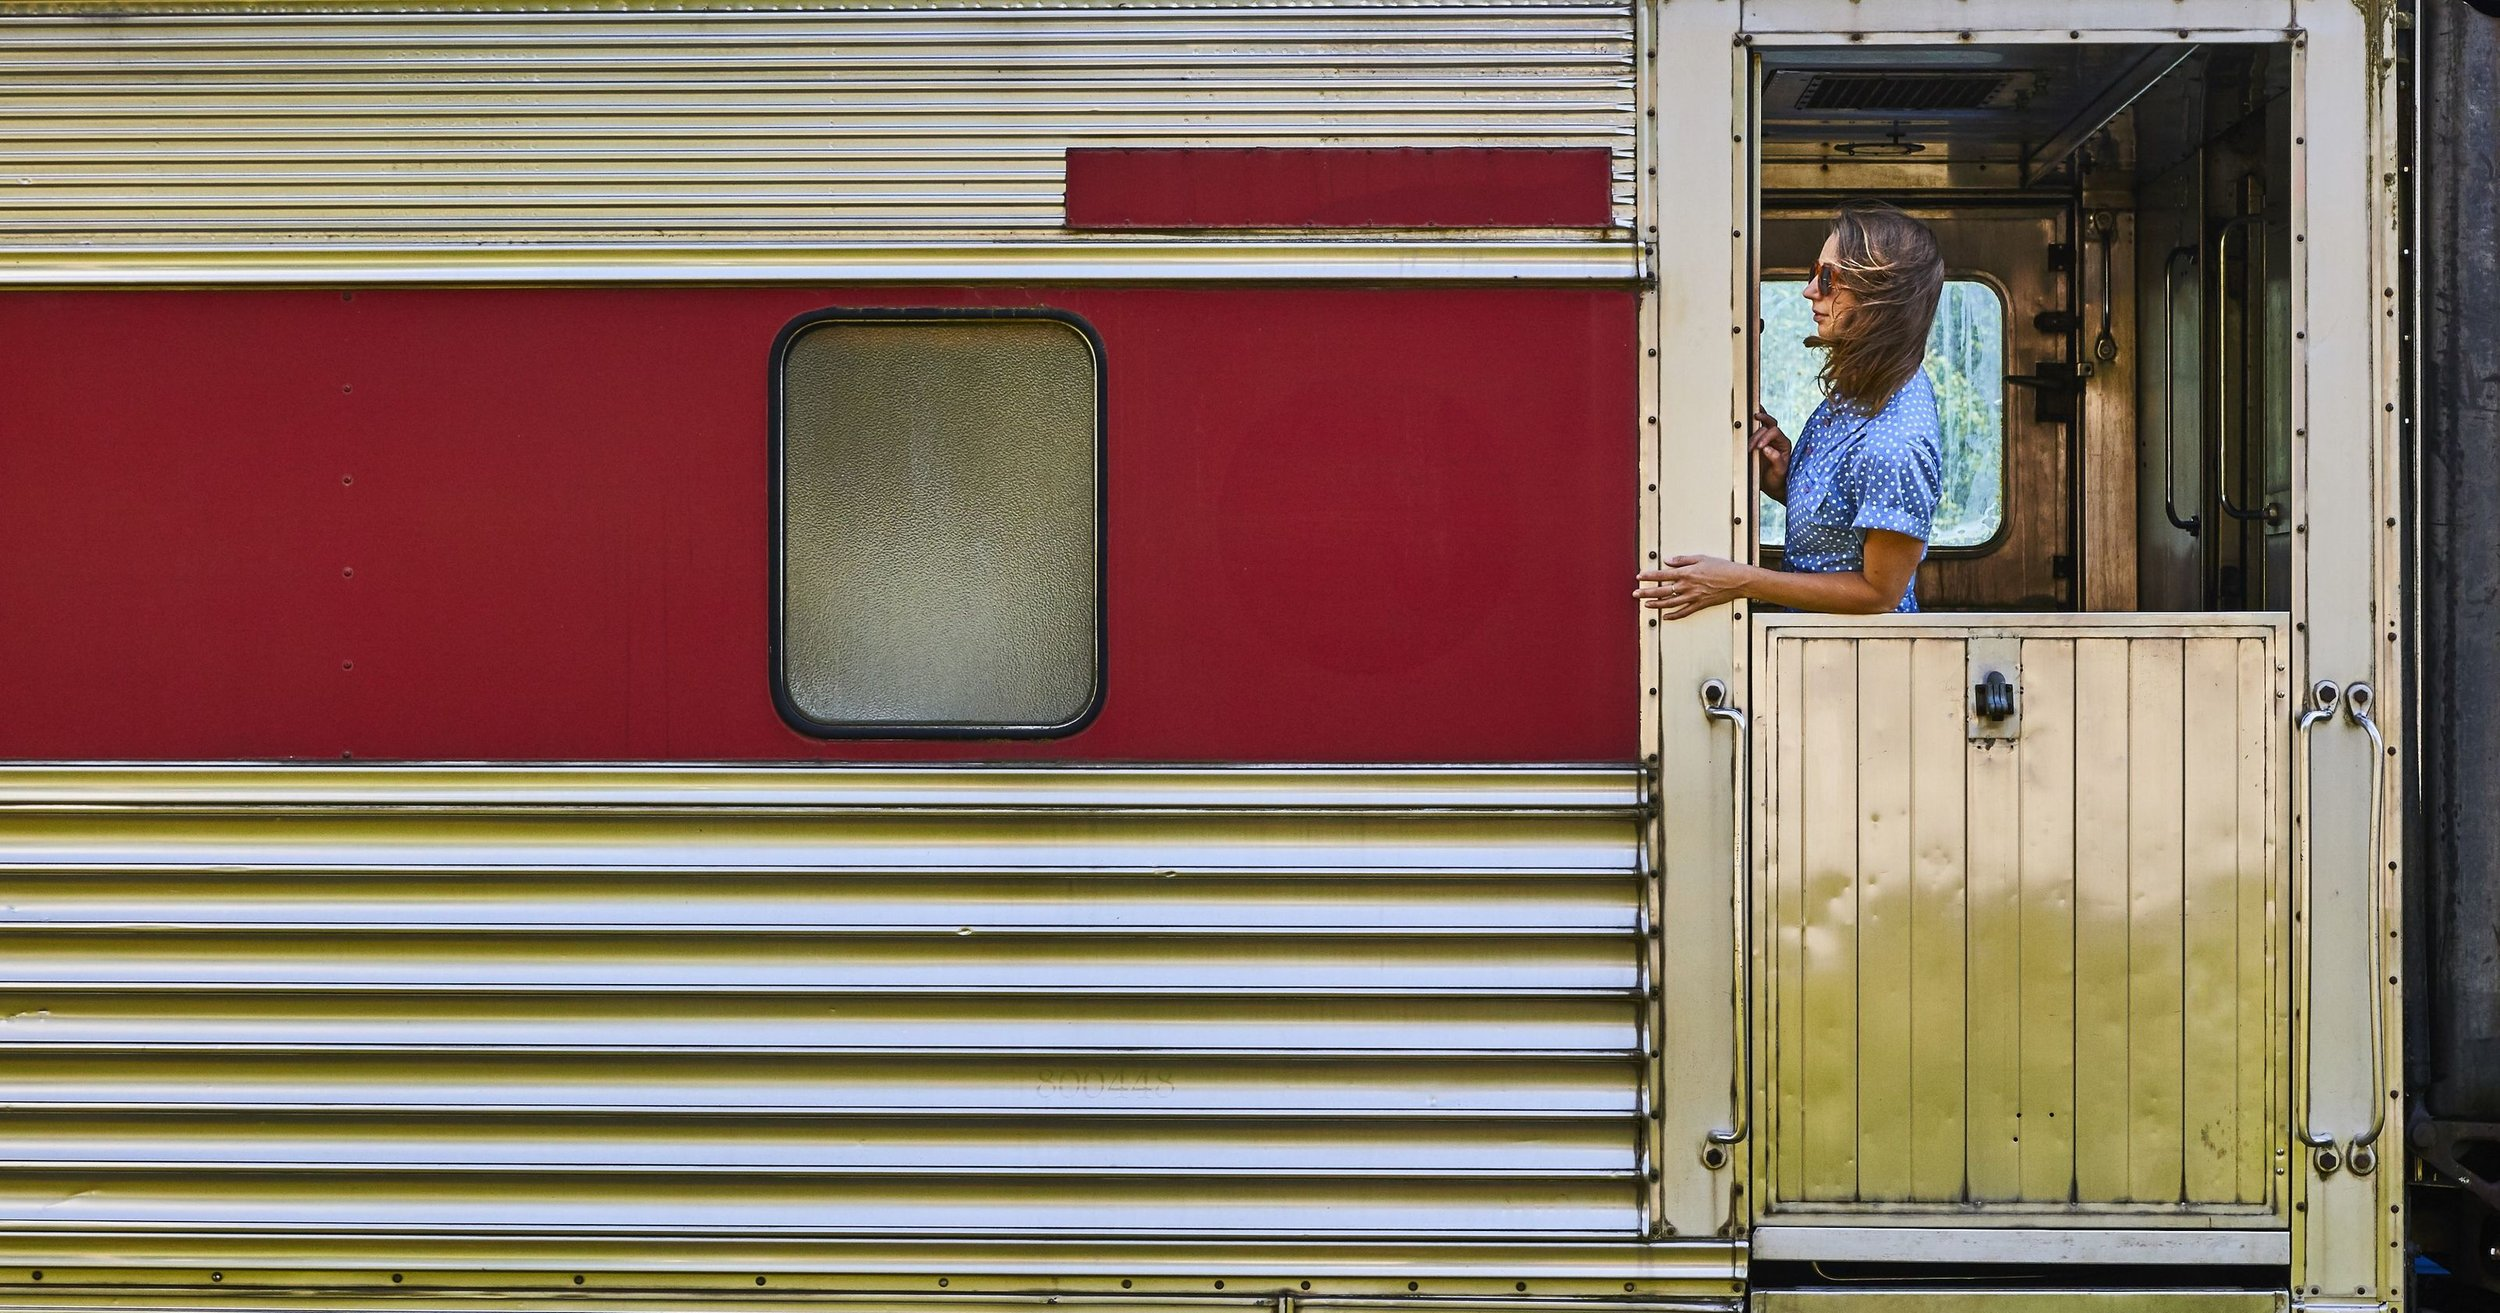 TRAVEL DOSE - Around the WORLDBY TRAIN